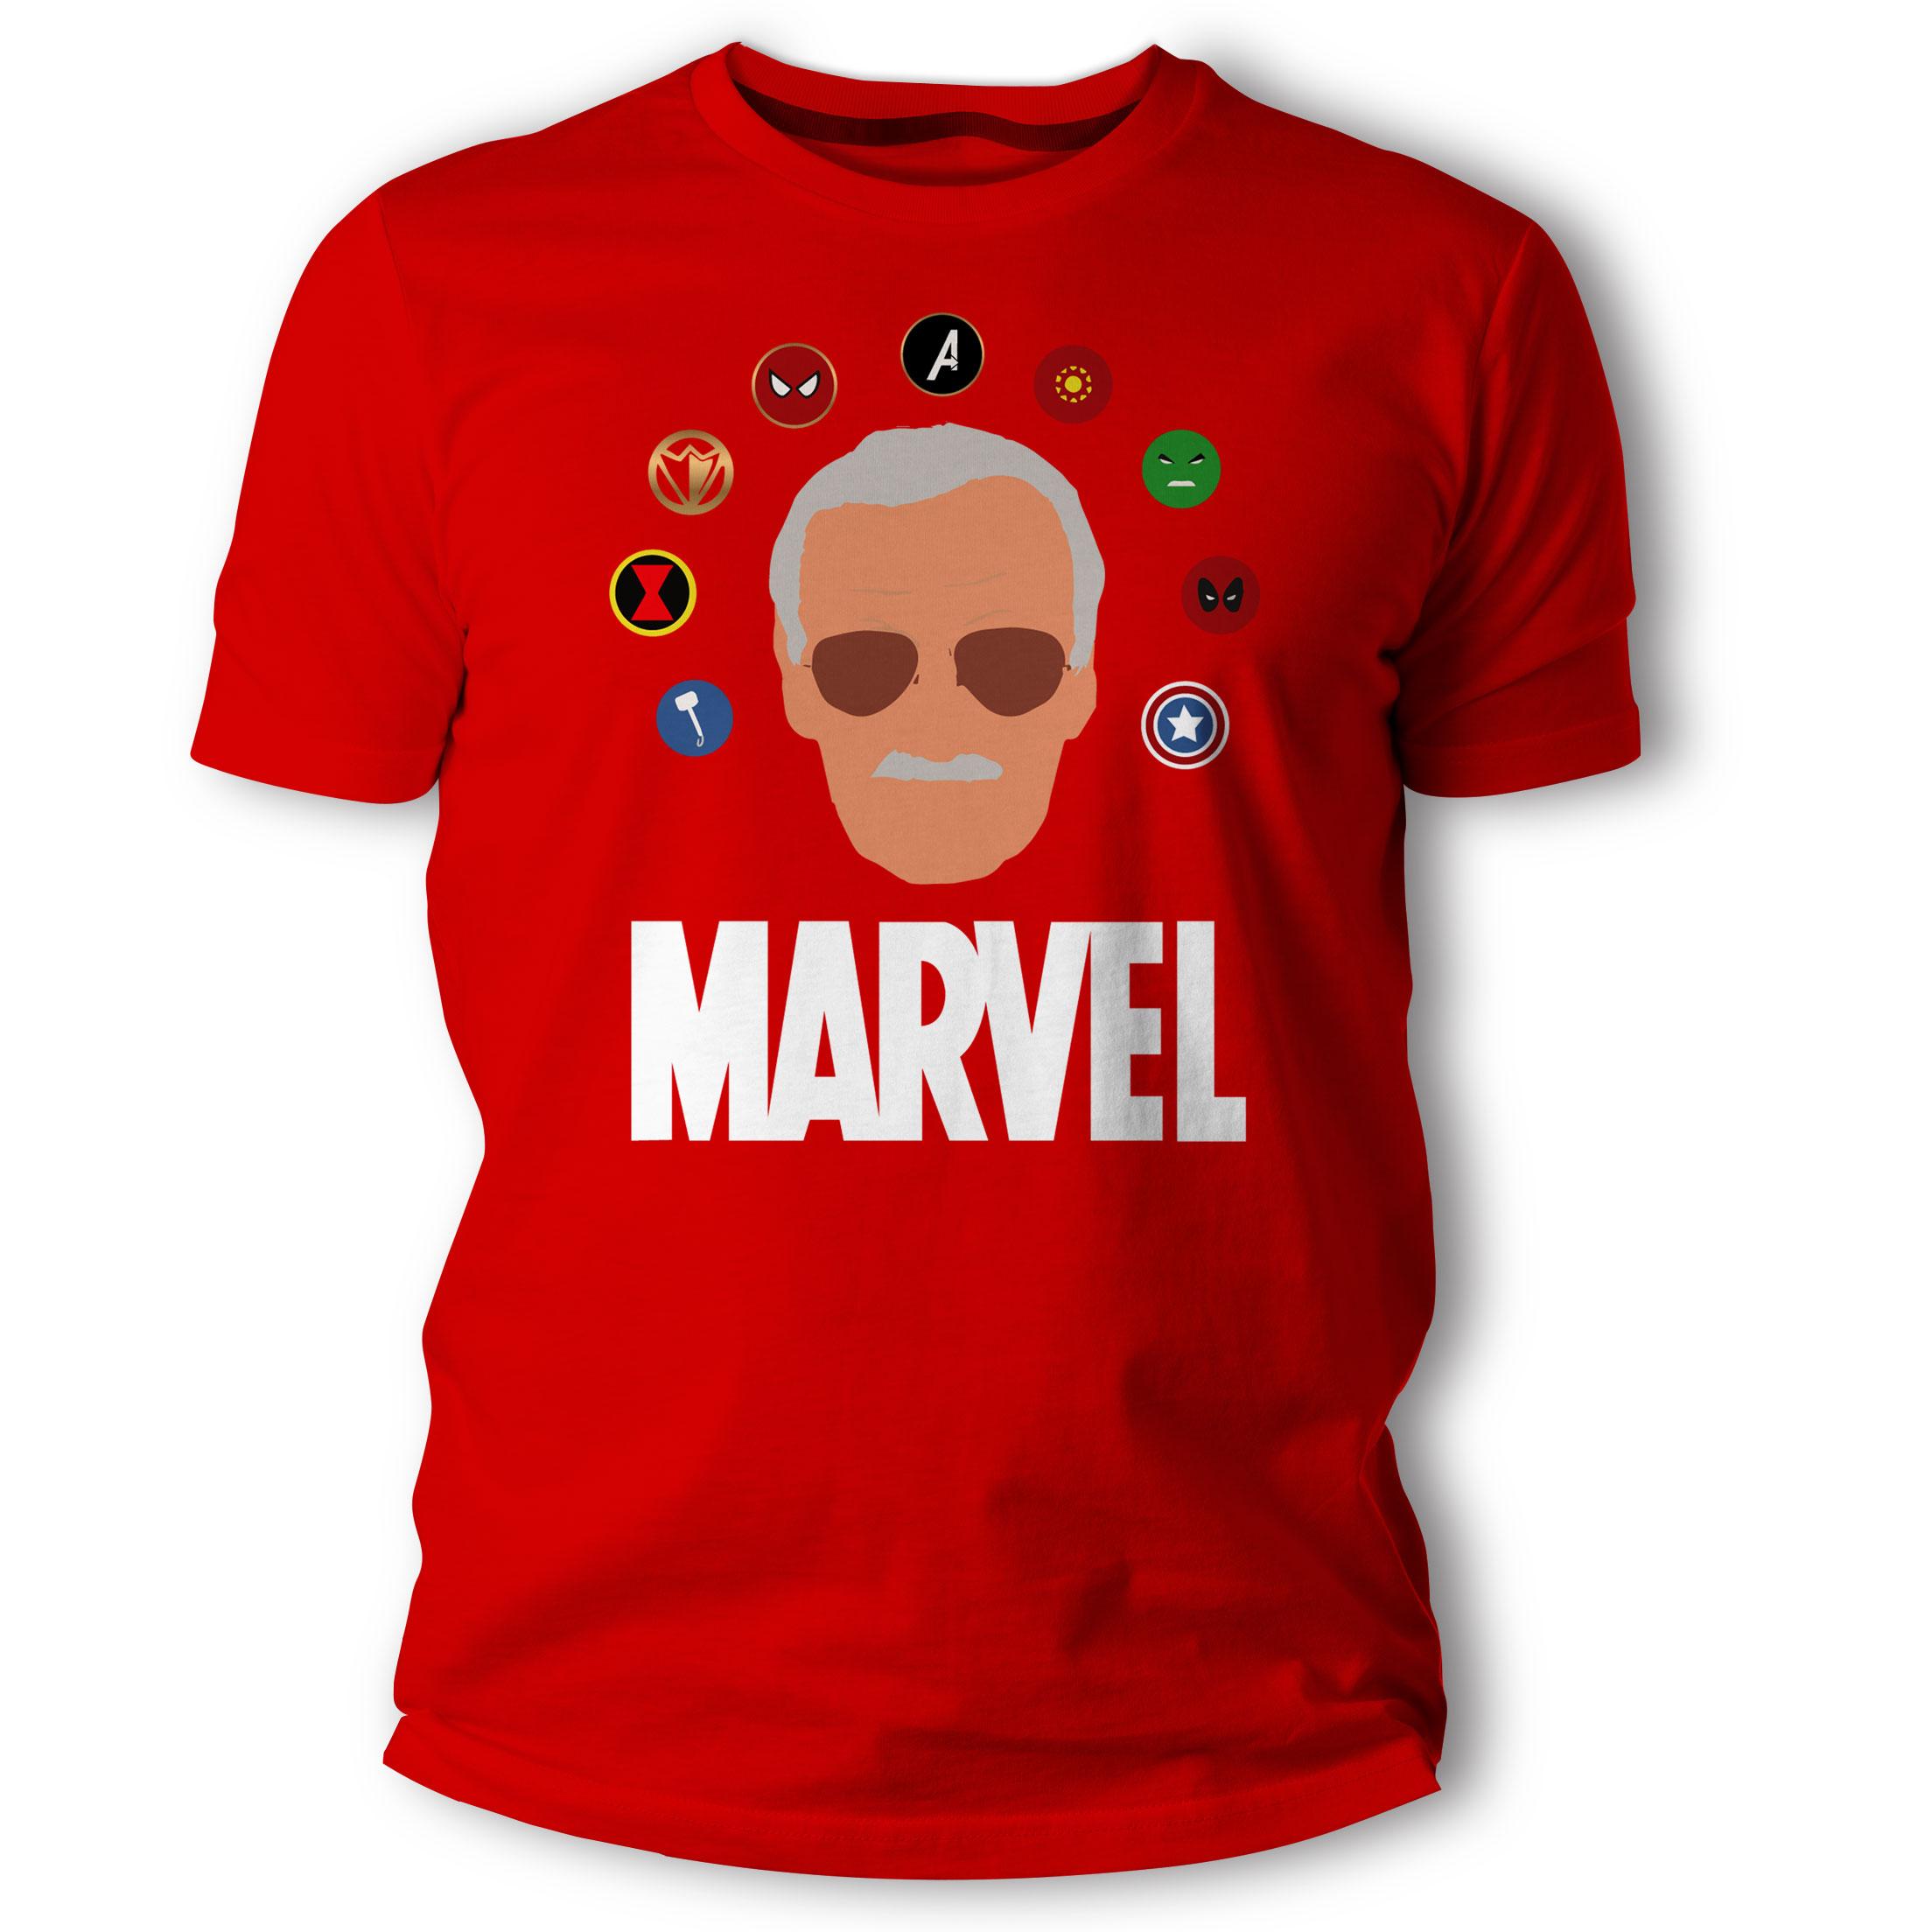 6236c17dc4 Regalame.ec - Camiseta Stan Lee - Avengers